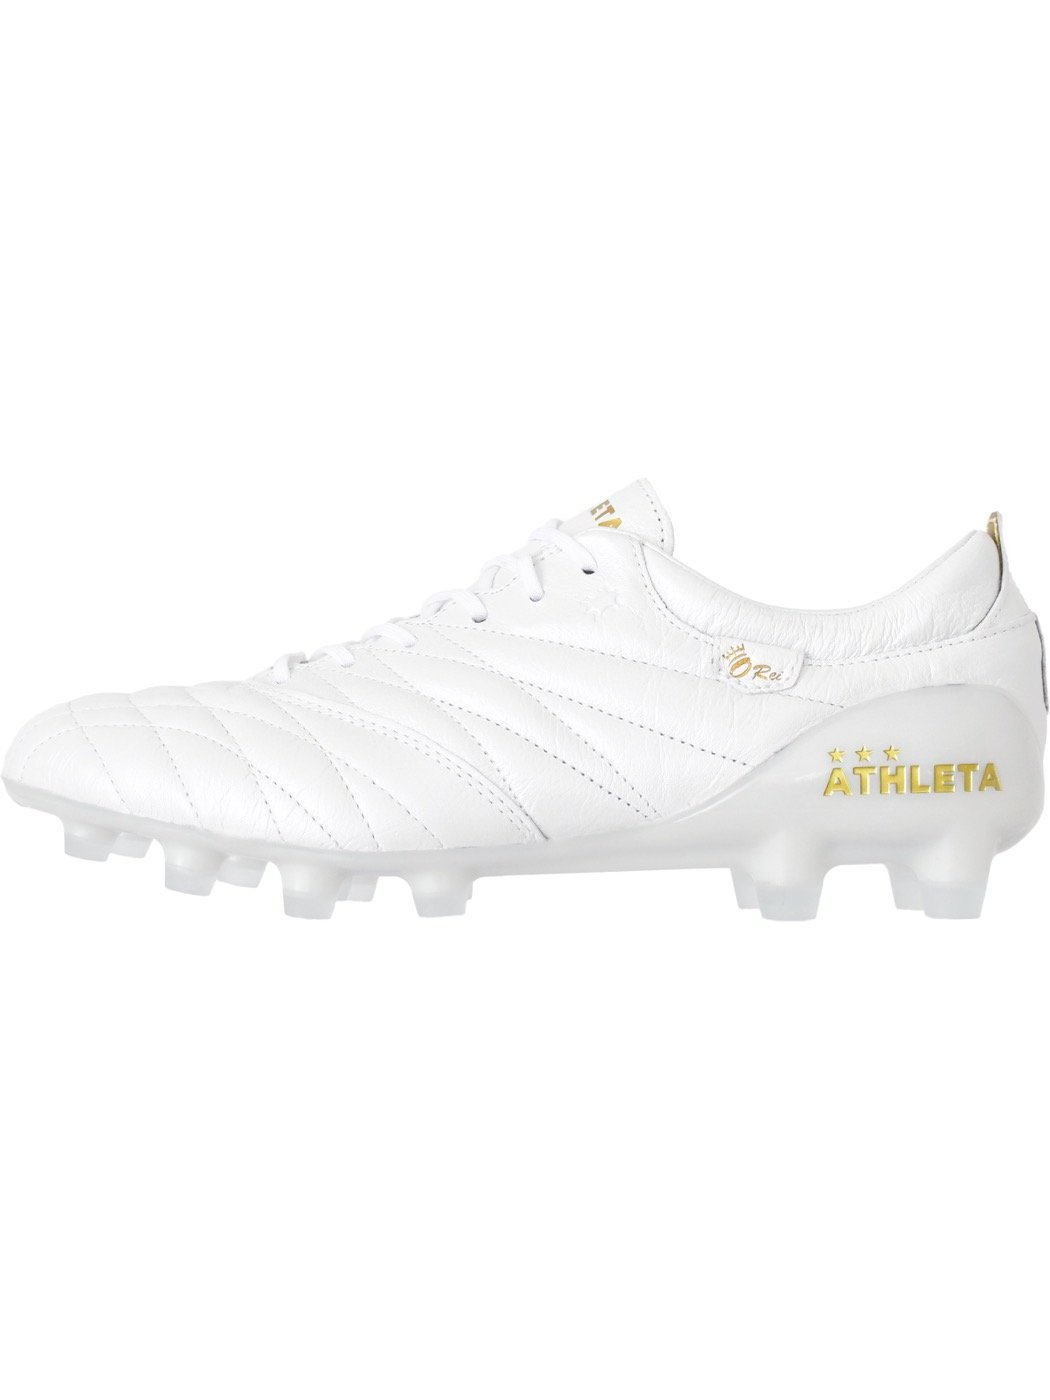 ATHLETA(アスレタ) O-Rei Futebol A001 10001-PW B01NBJ8DIE 26|PWH PWH 26